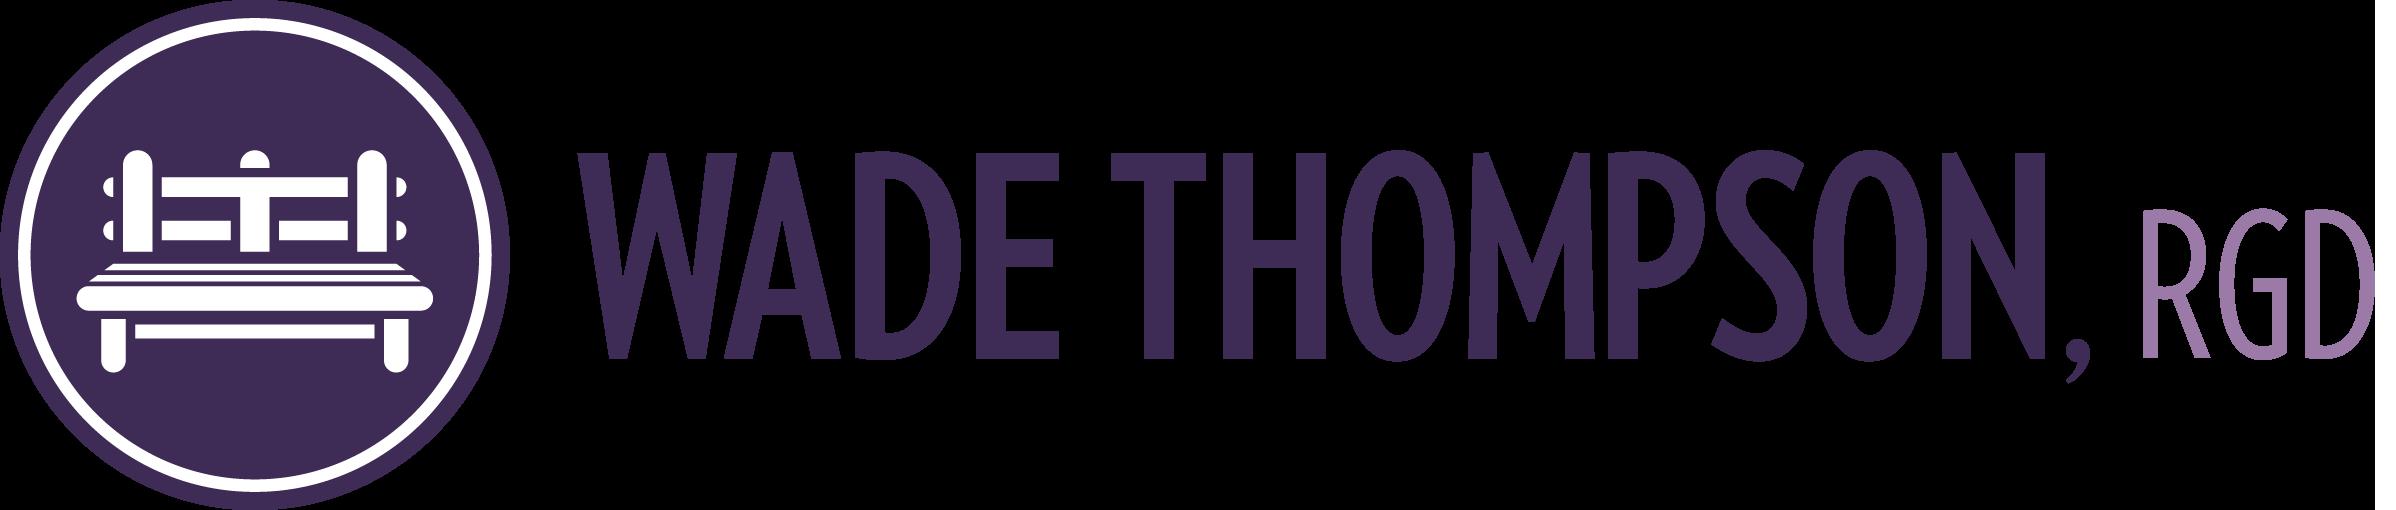 WADE THOMPSON